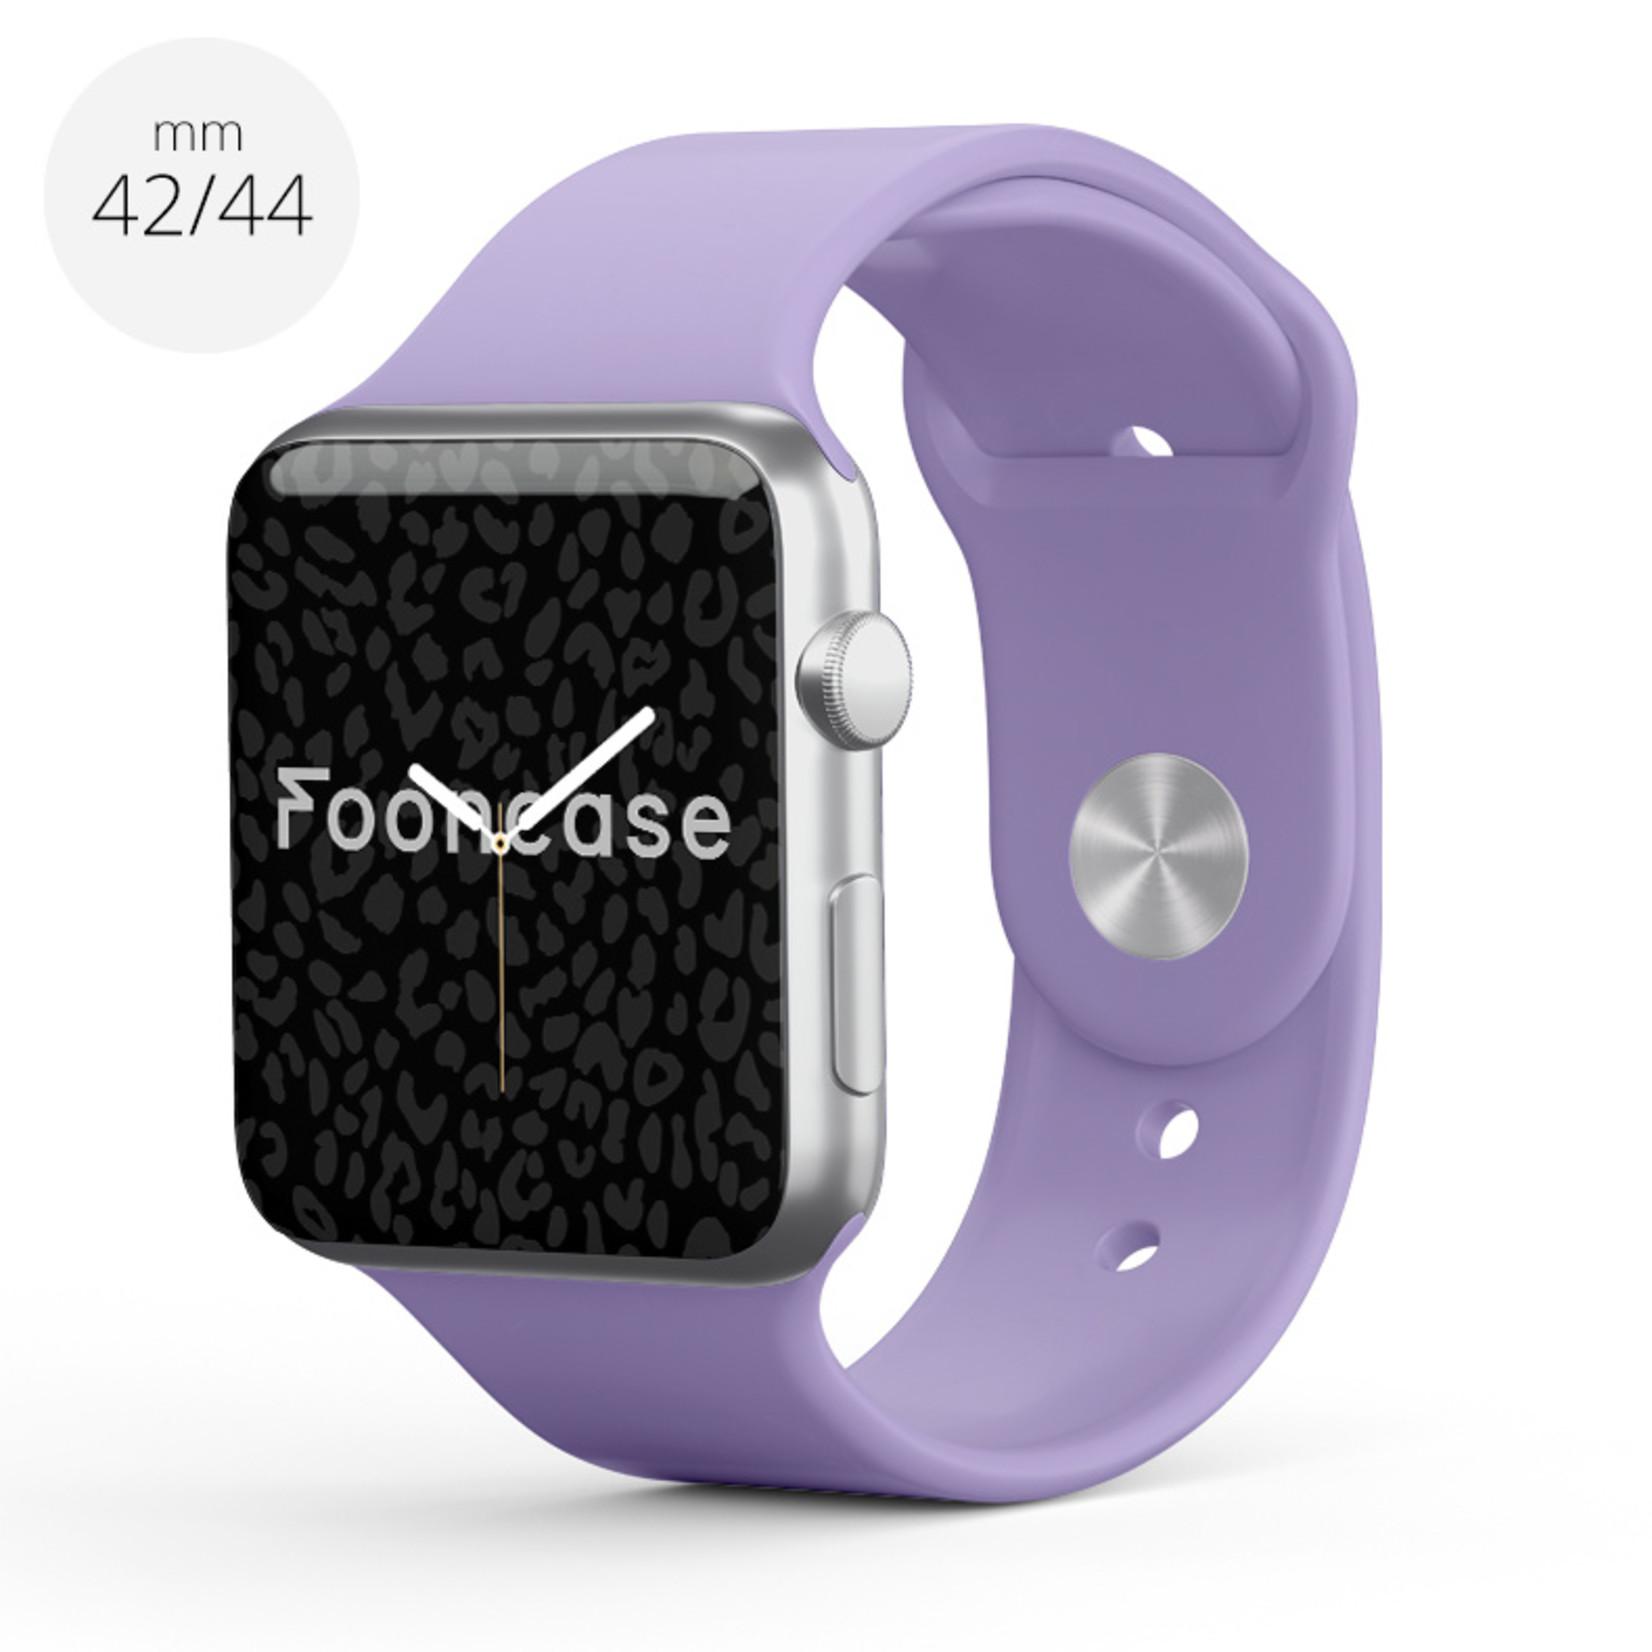 FOONCASE Apple Watch Series (1 t/m 6 / SE) - Pastel lila - 42/44mm